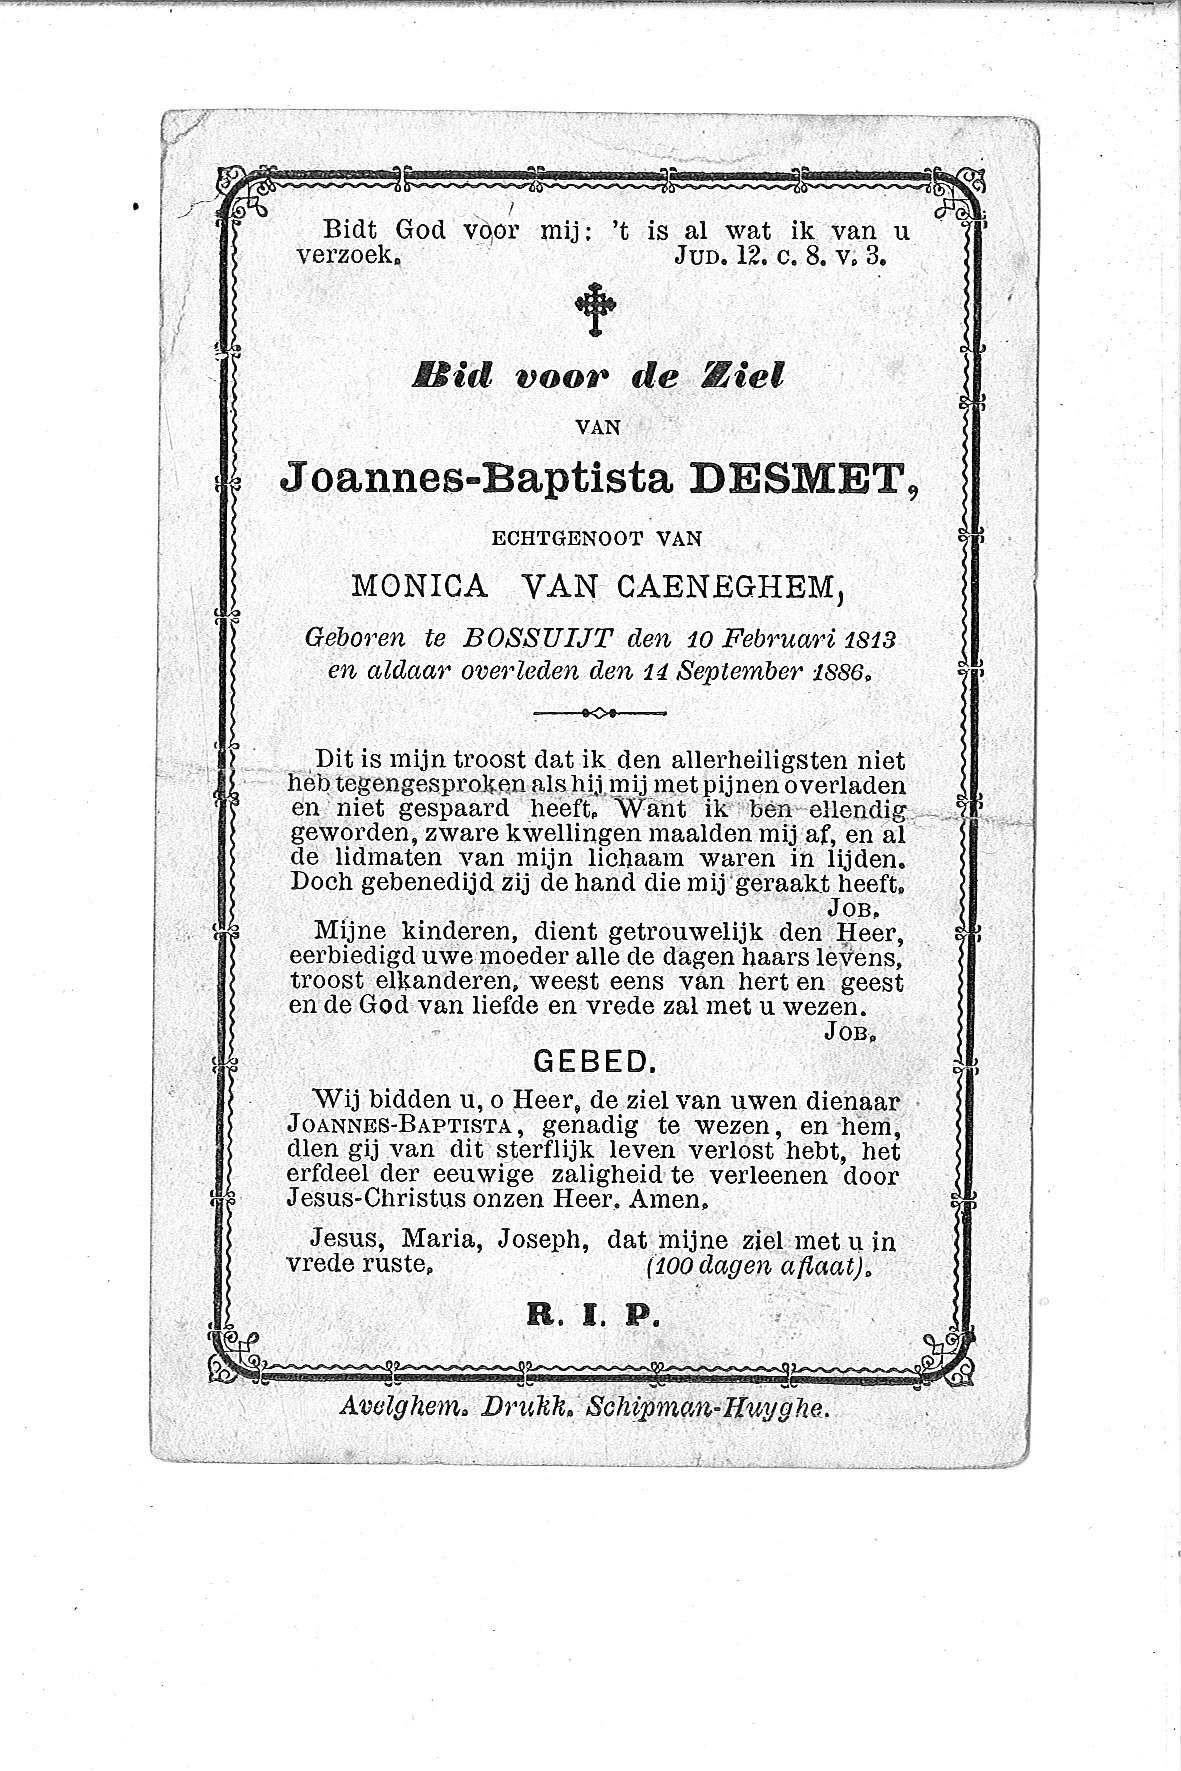 Joannes-Baptista (1886) 20120424083759_00255.jpg